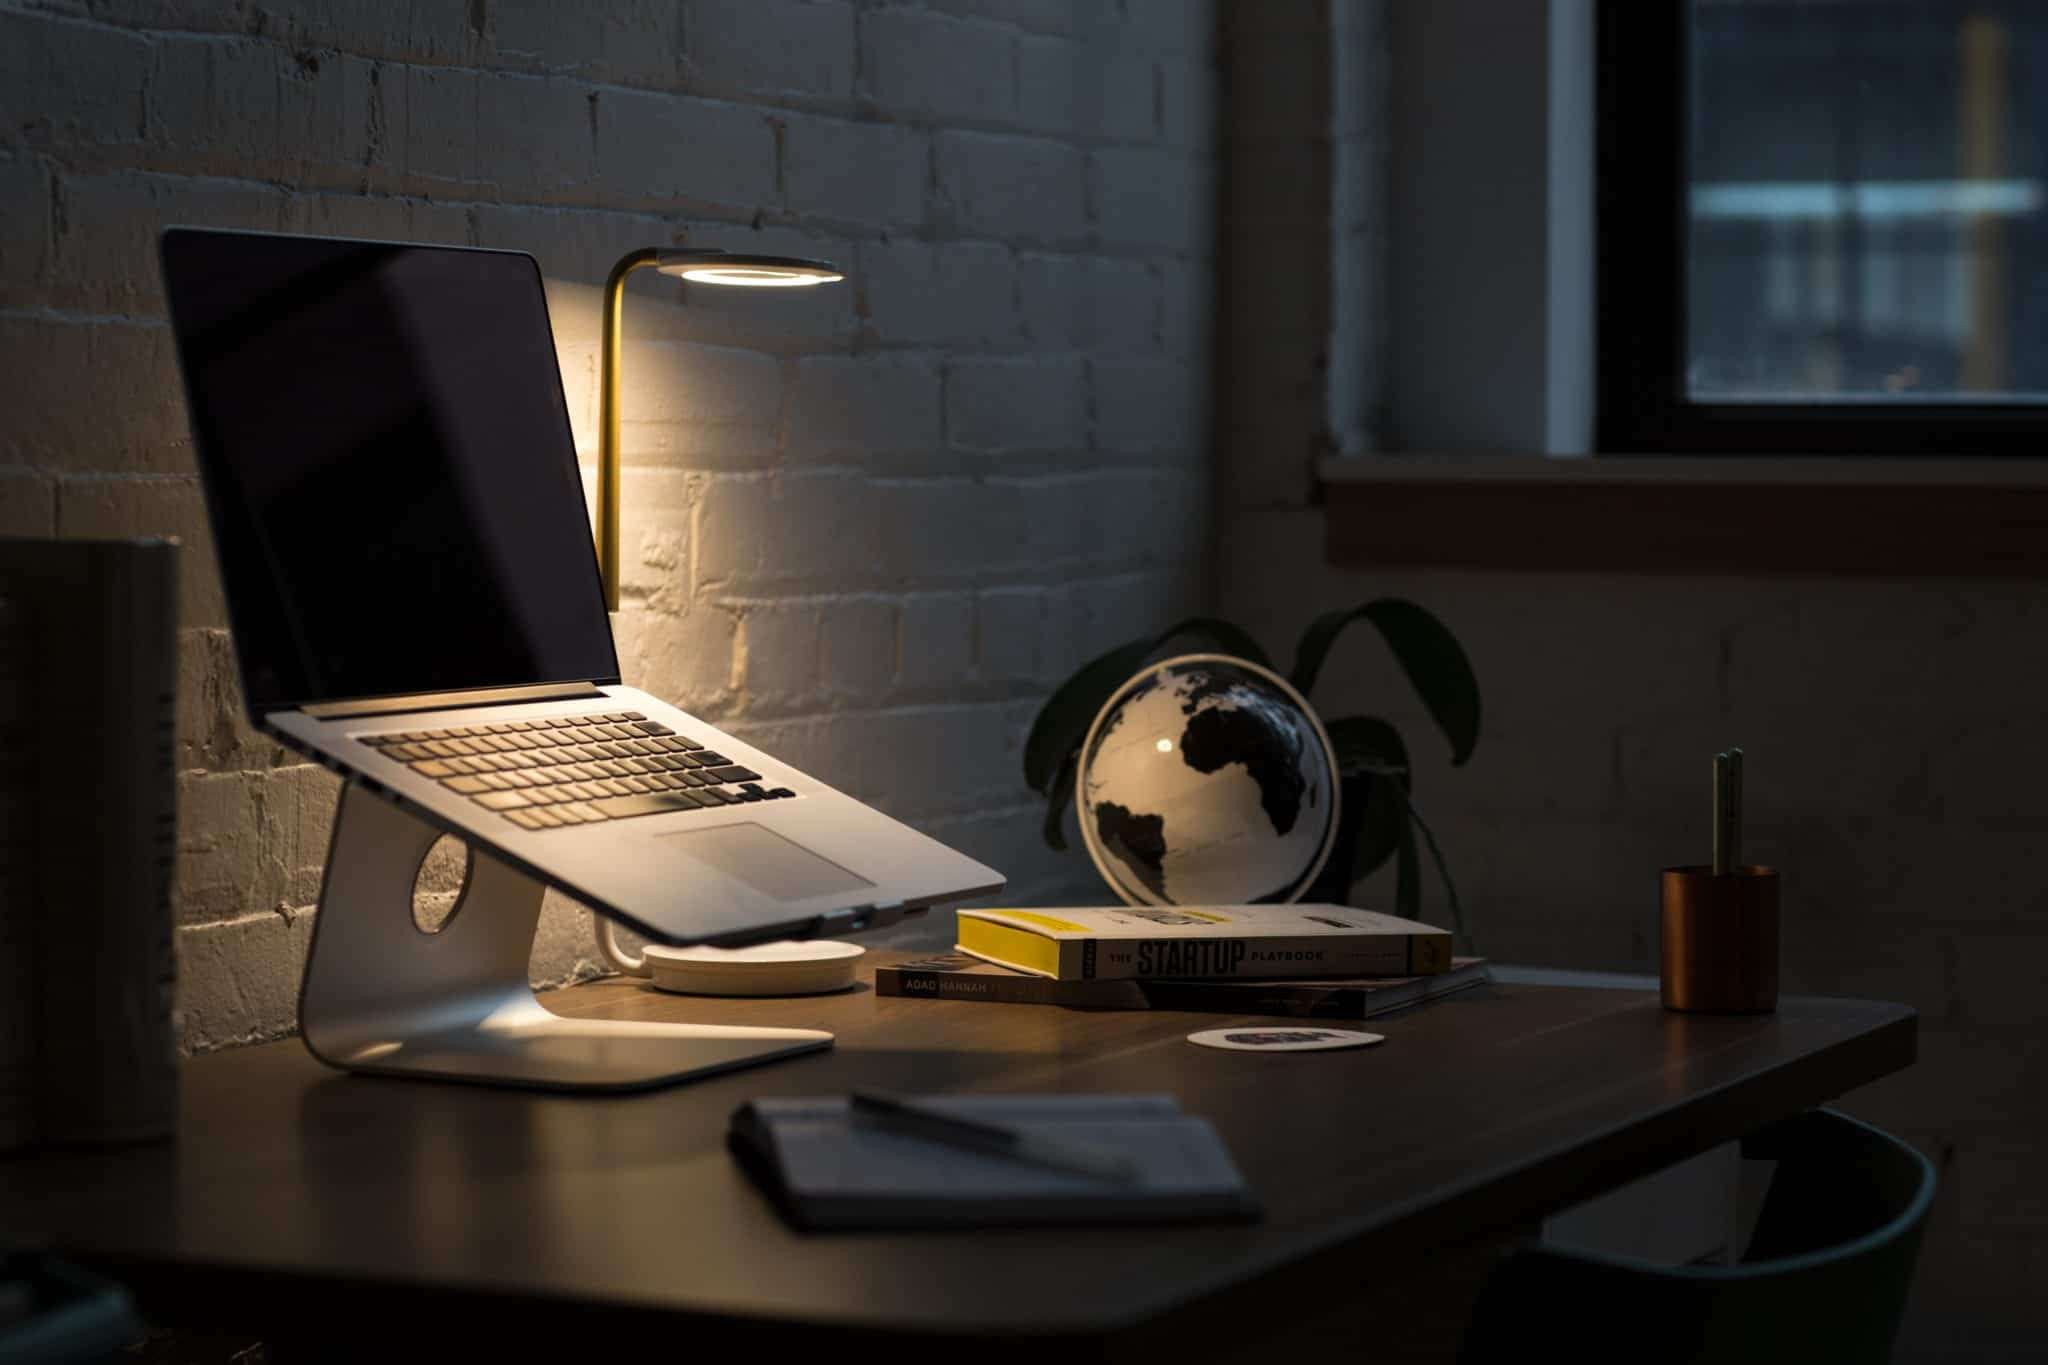 apple-computer-desk-374857